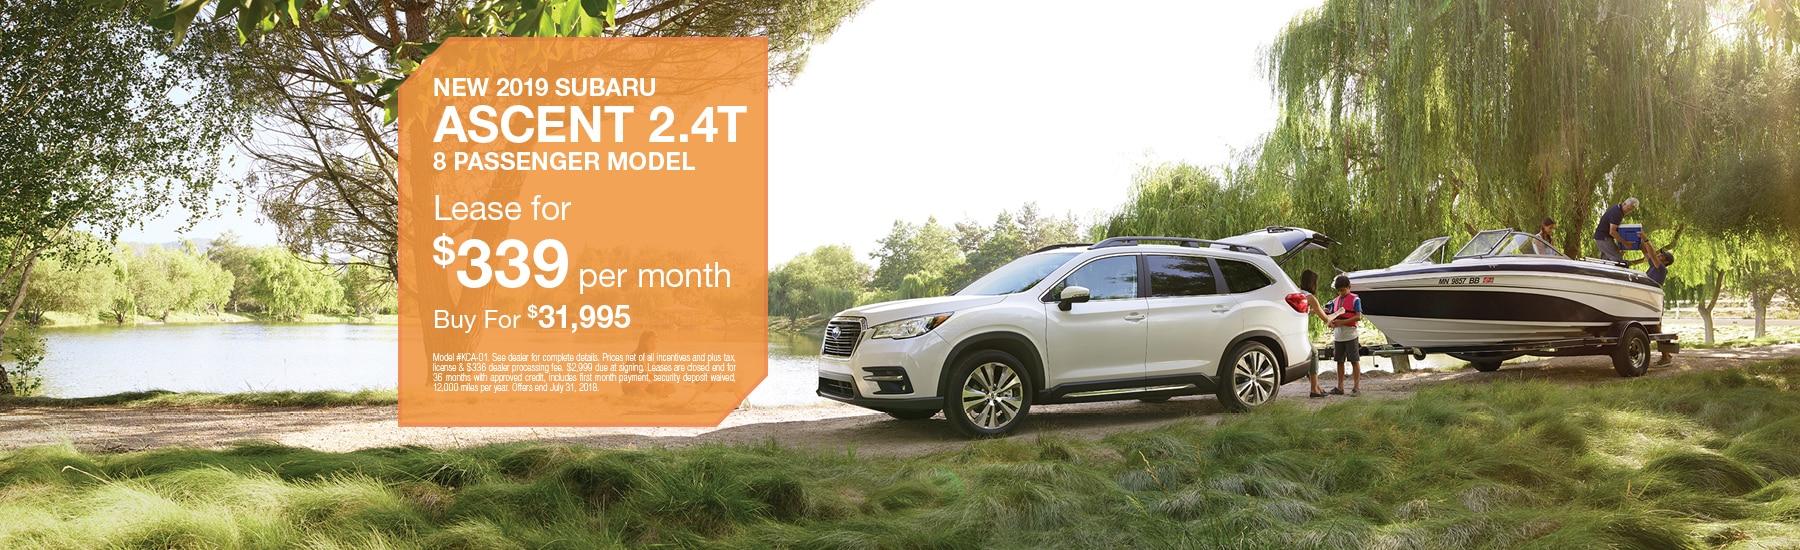 Car Dealerships In Richmond Ky >> Quantrell Subaru | New 2018 & Used Subaru Dealer in Lexington